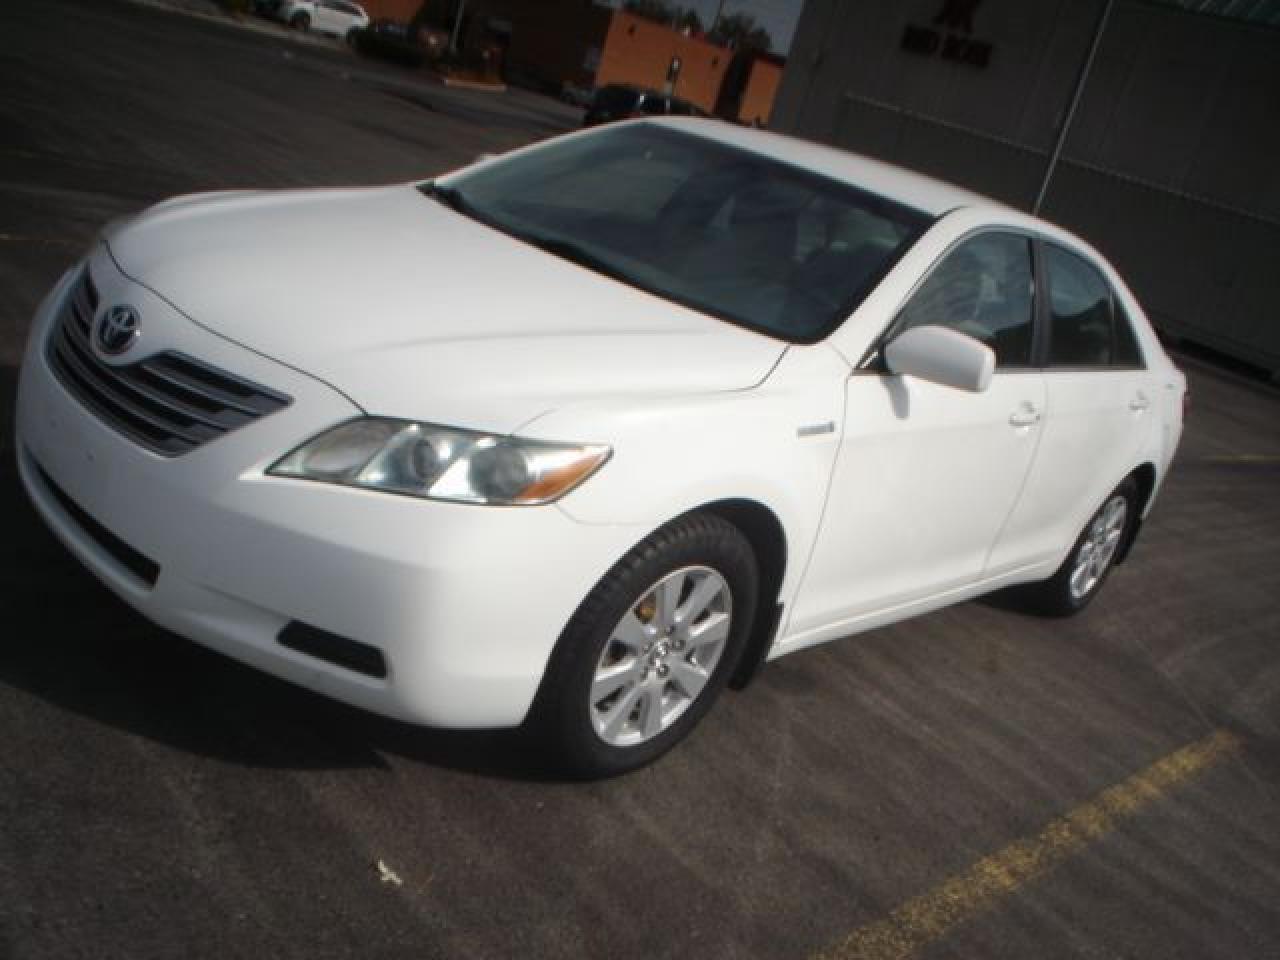 Photo of White 2008 Toyota Camry